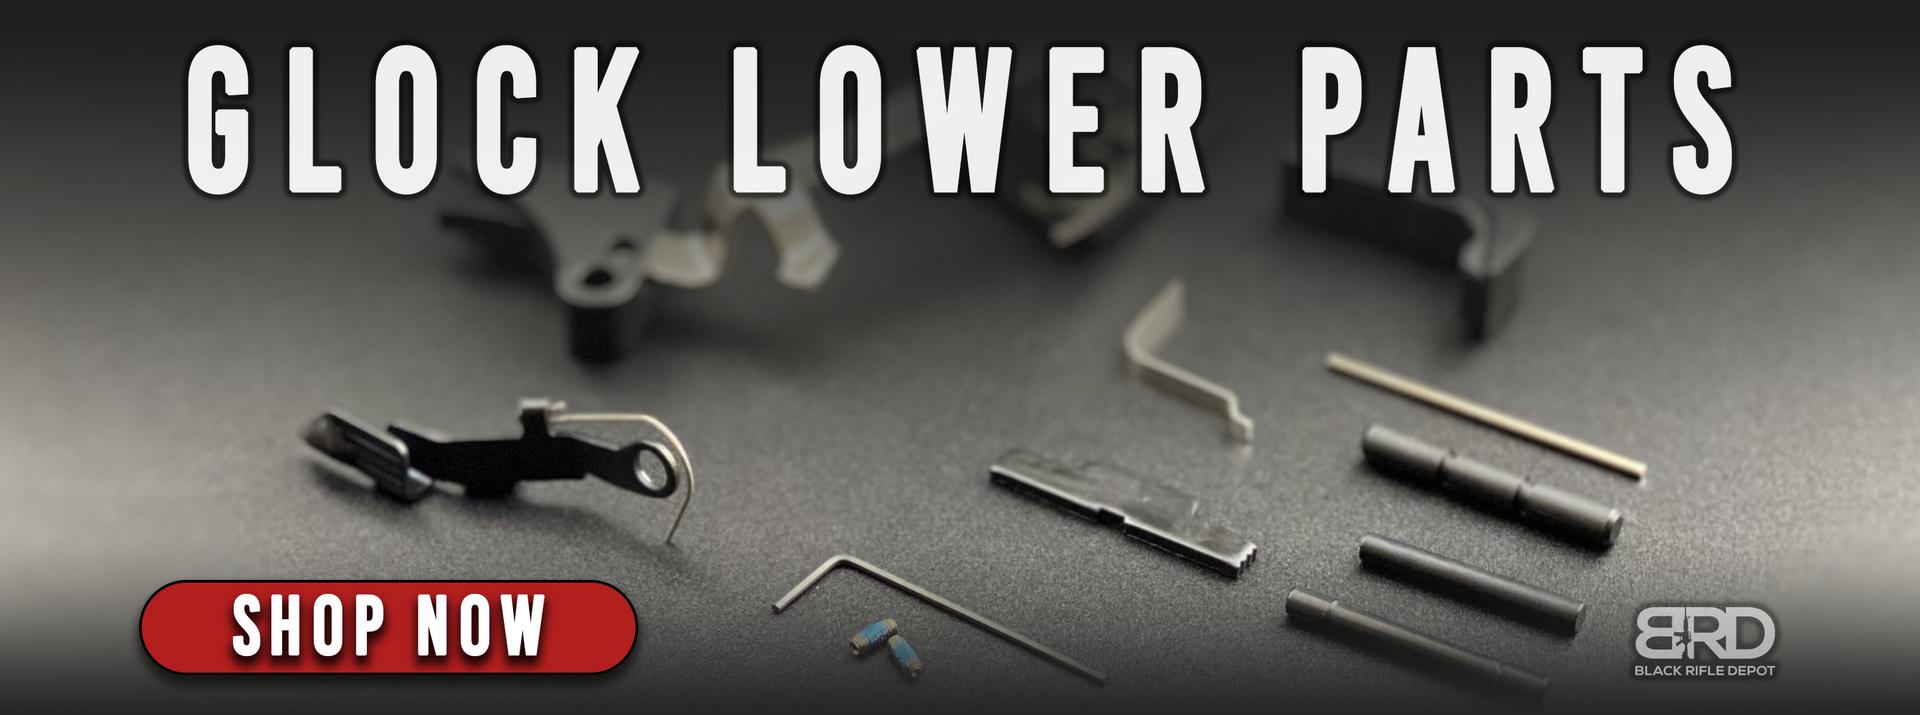 Glock Lower Parts Kits, Glock Parts Kits, Glock Parts, and Glock Lower Parts at the very best prices.